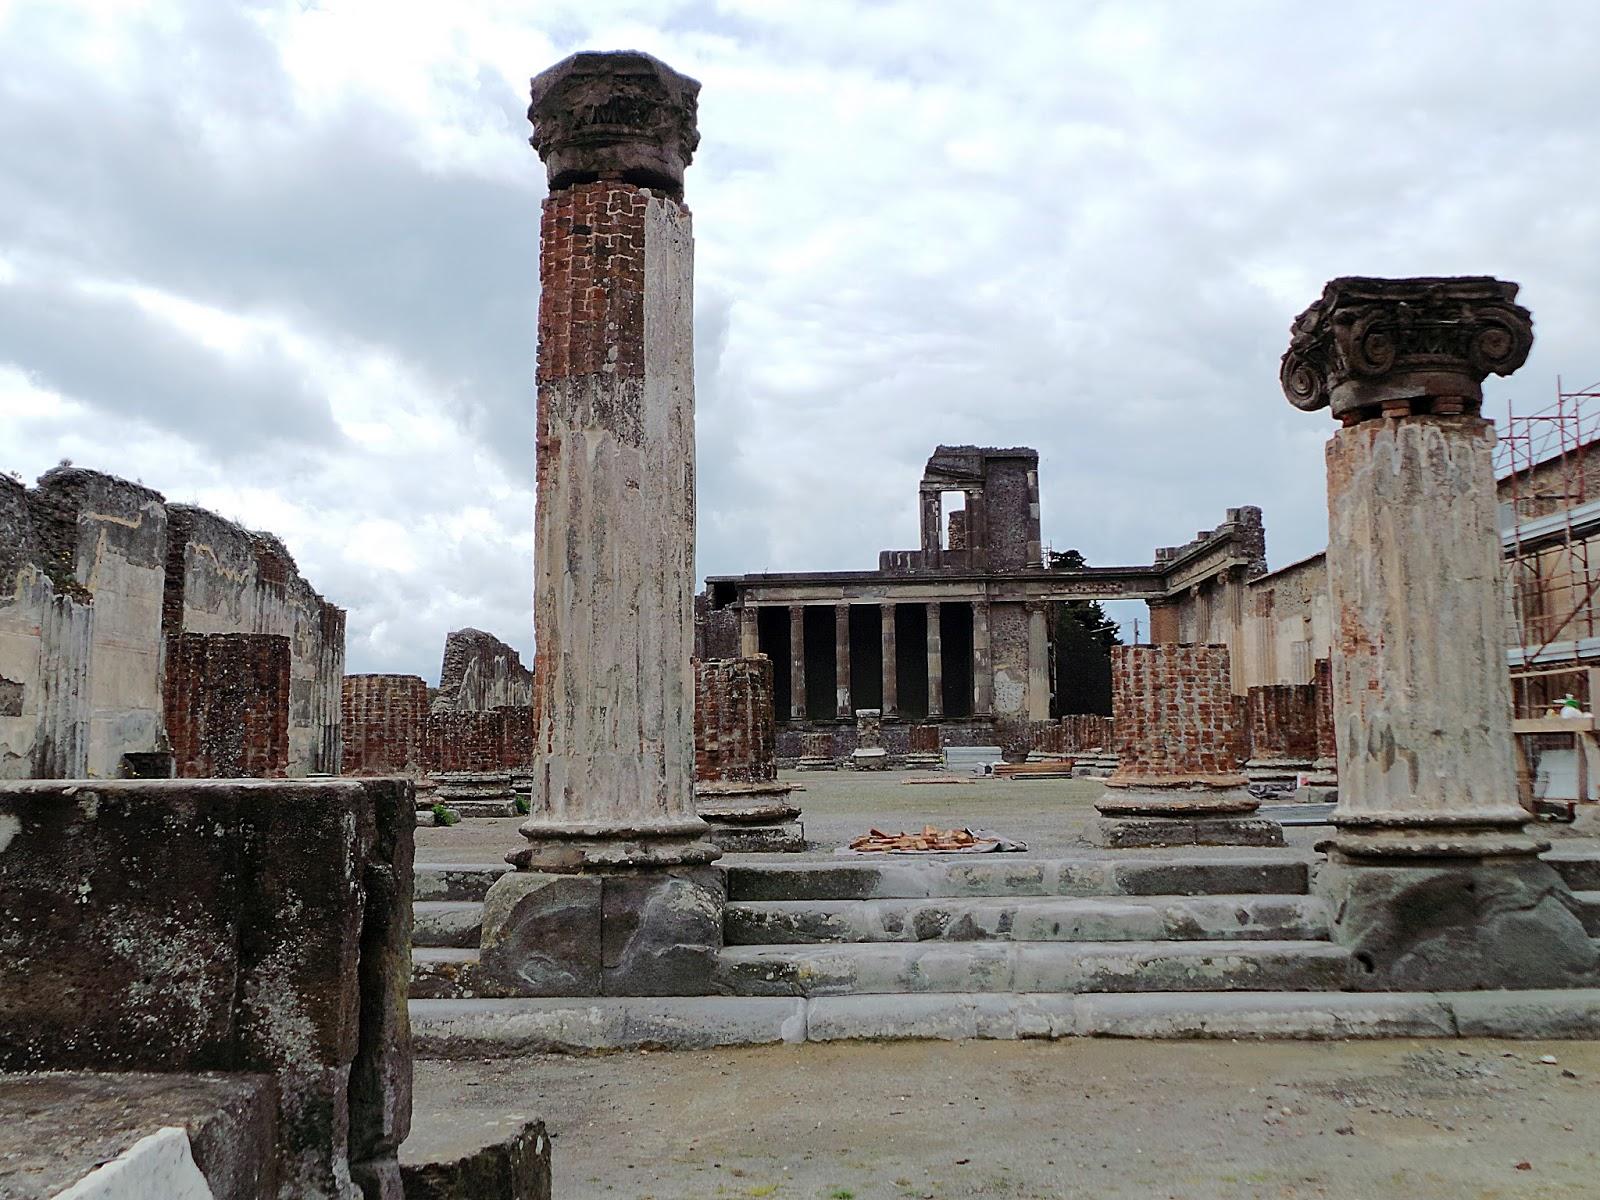 Ejemplo de basílica, basílica romana de Pompeya (Italia).